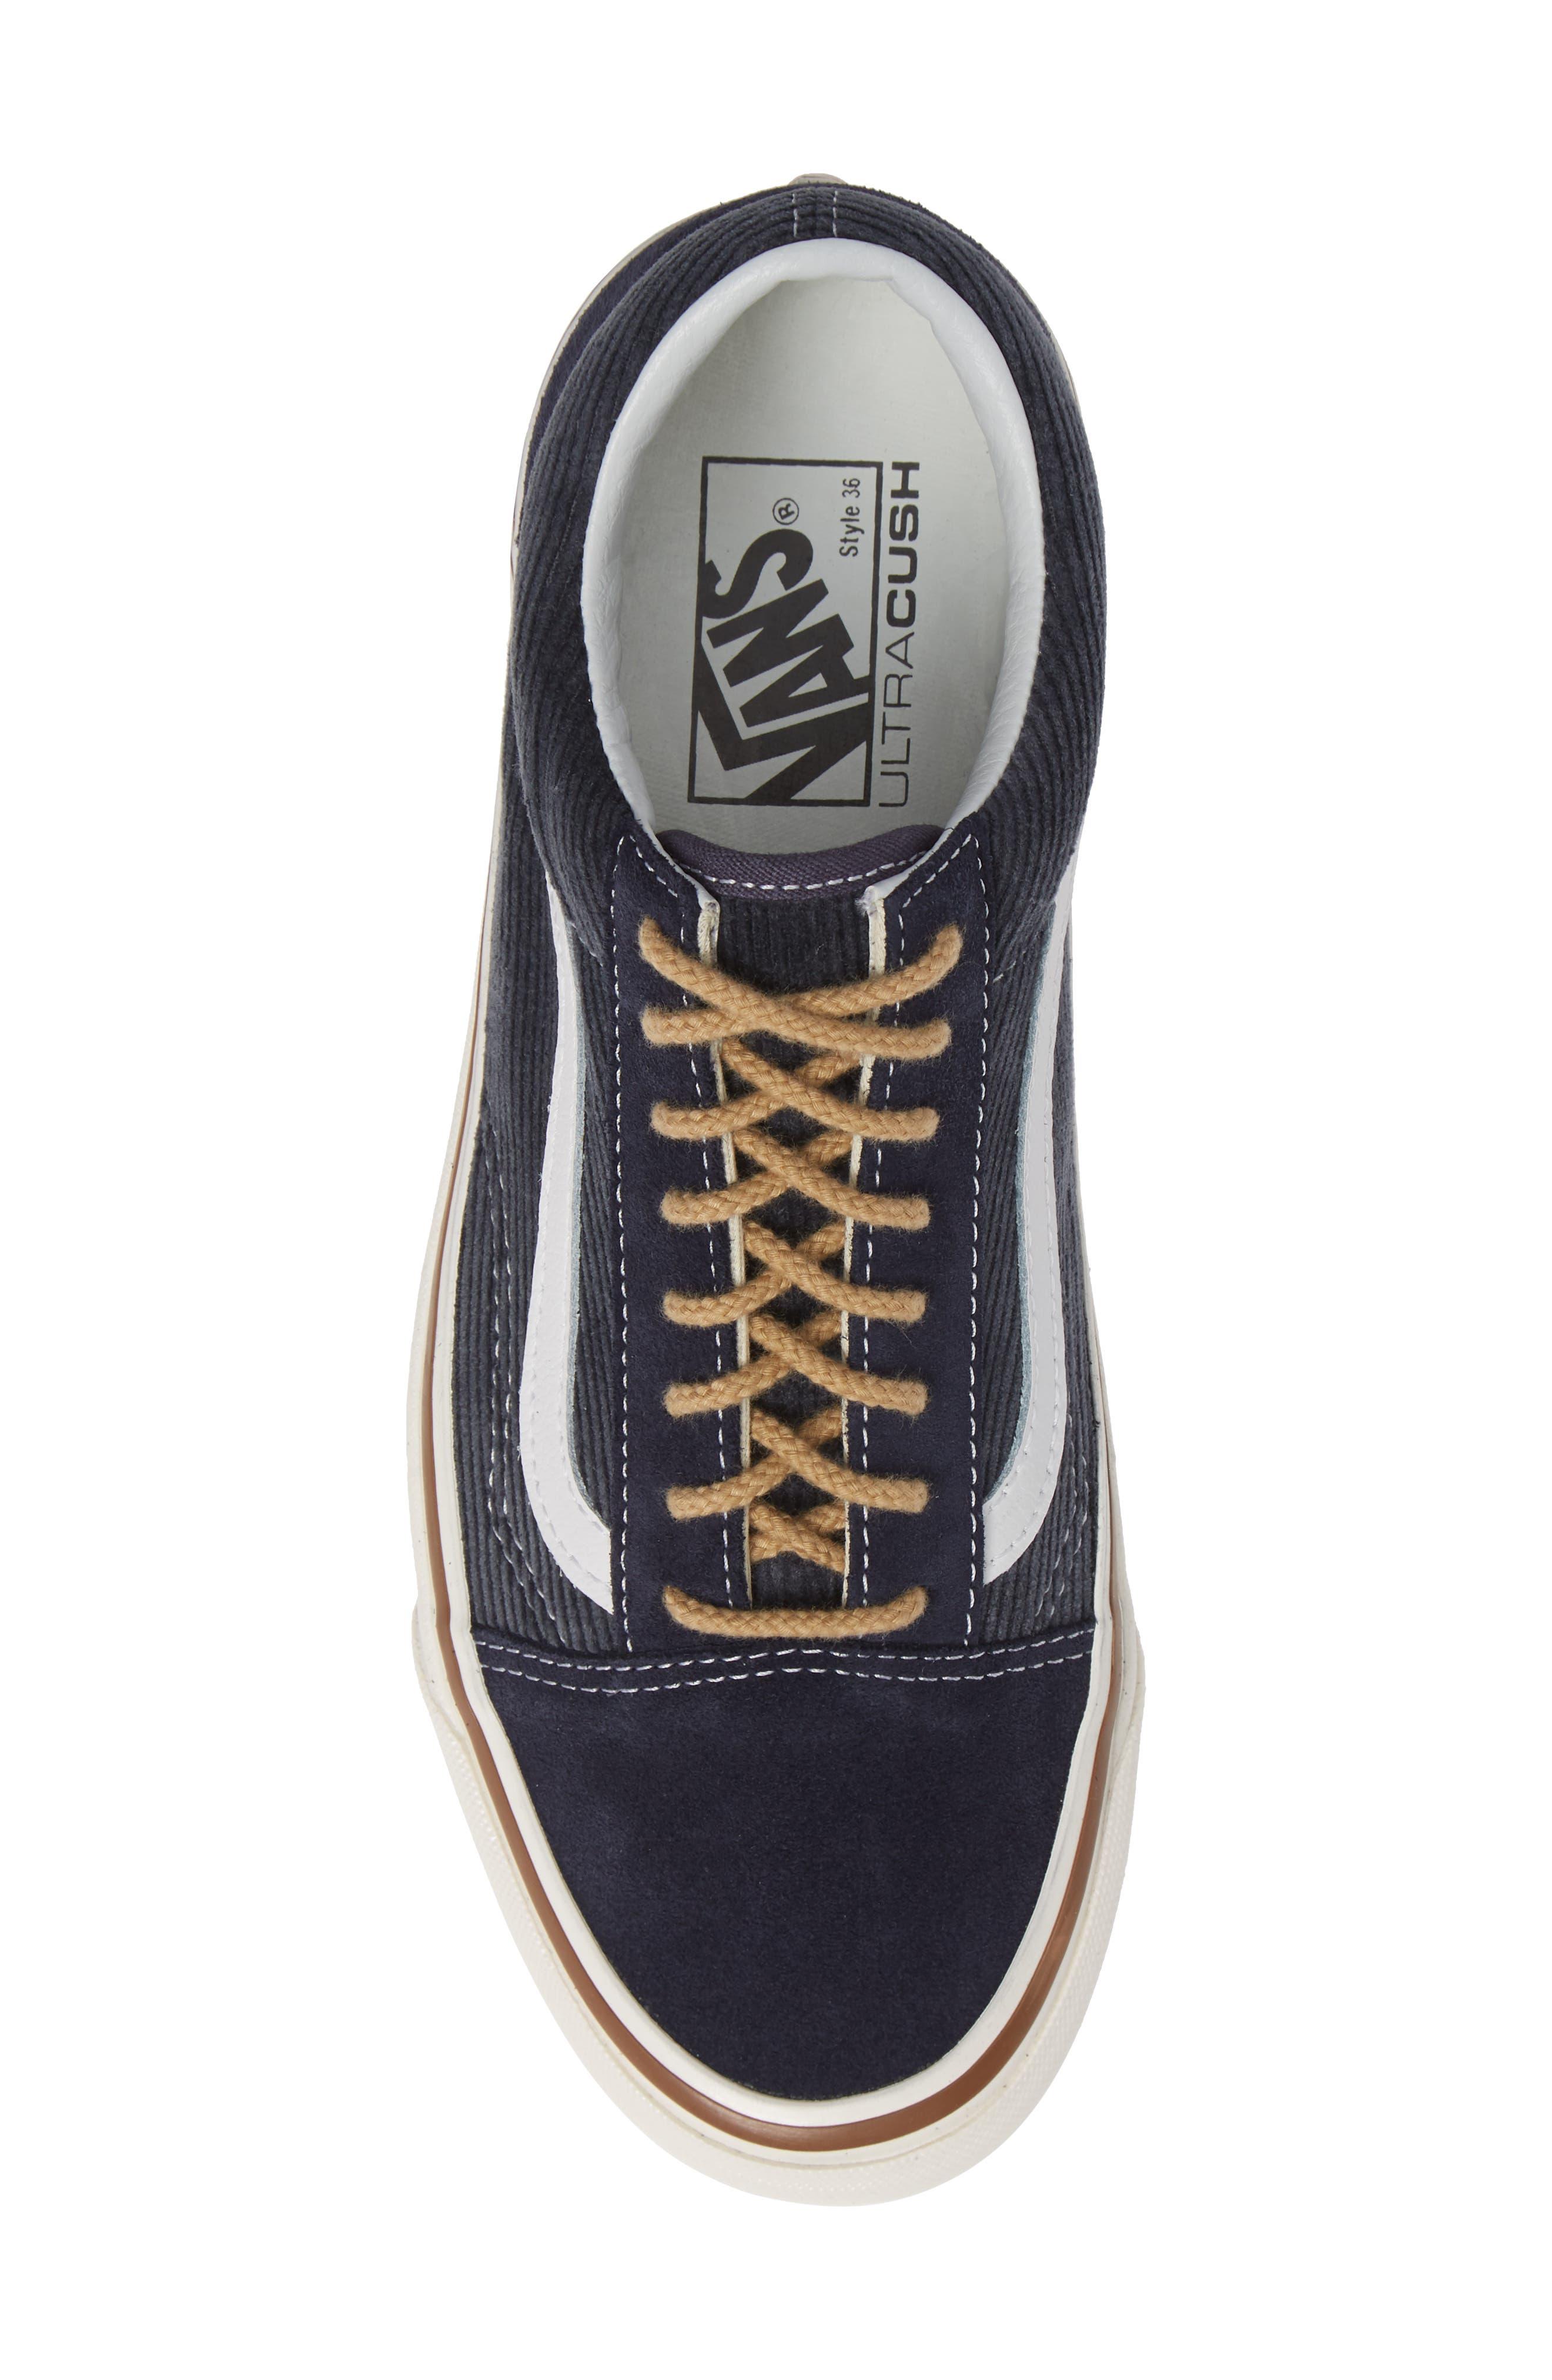 Anaheim Factory Old Skool 36 DX Sneaker,                             Alternate thumbnail 5, color,                             NAVY/ SUEDE/ CORDUROY